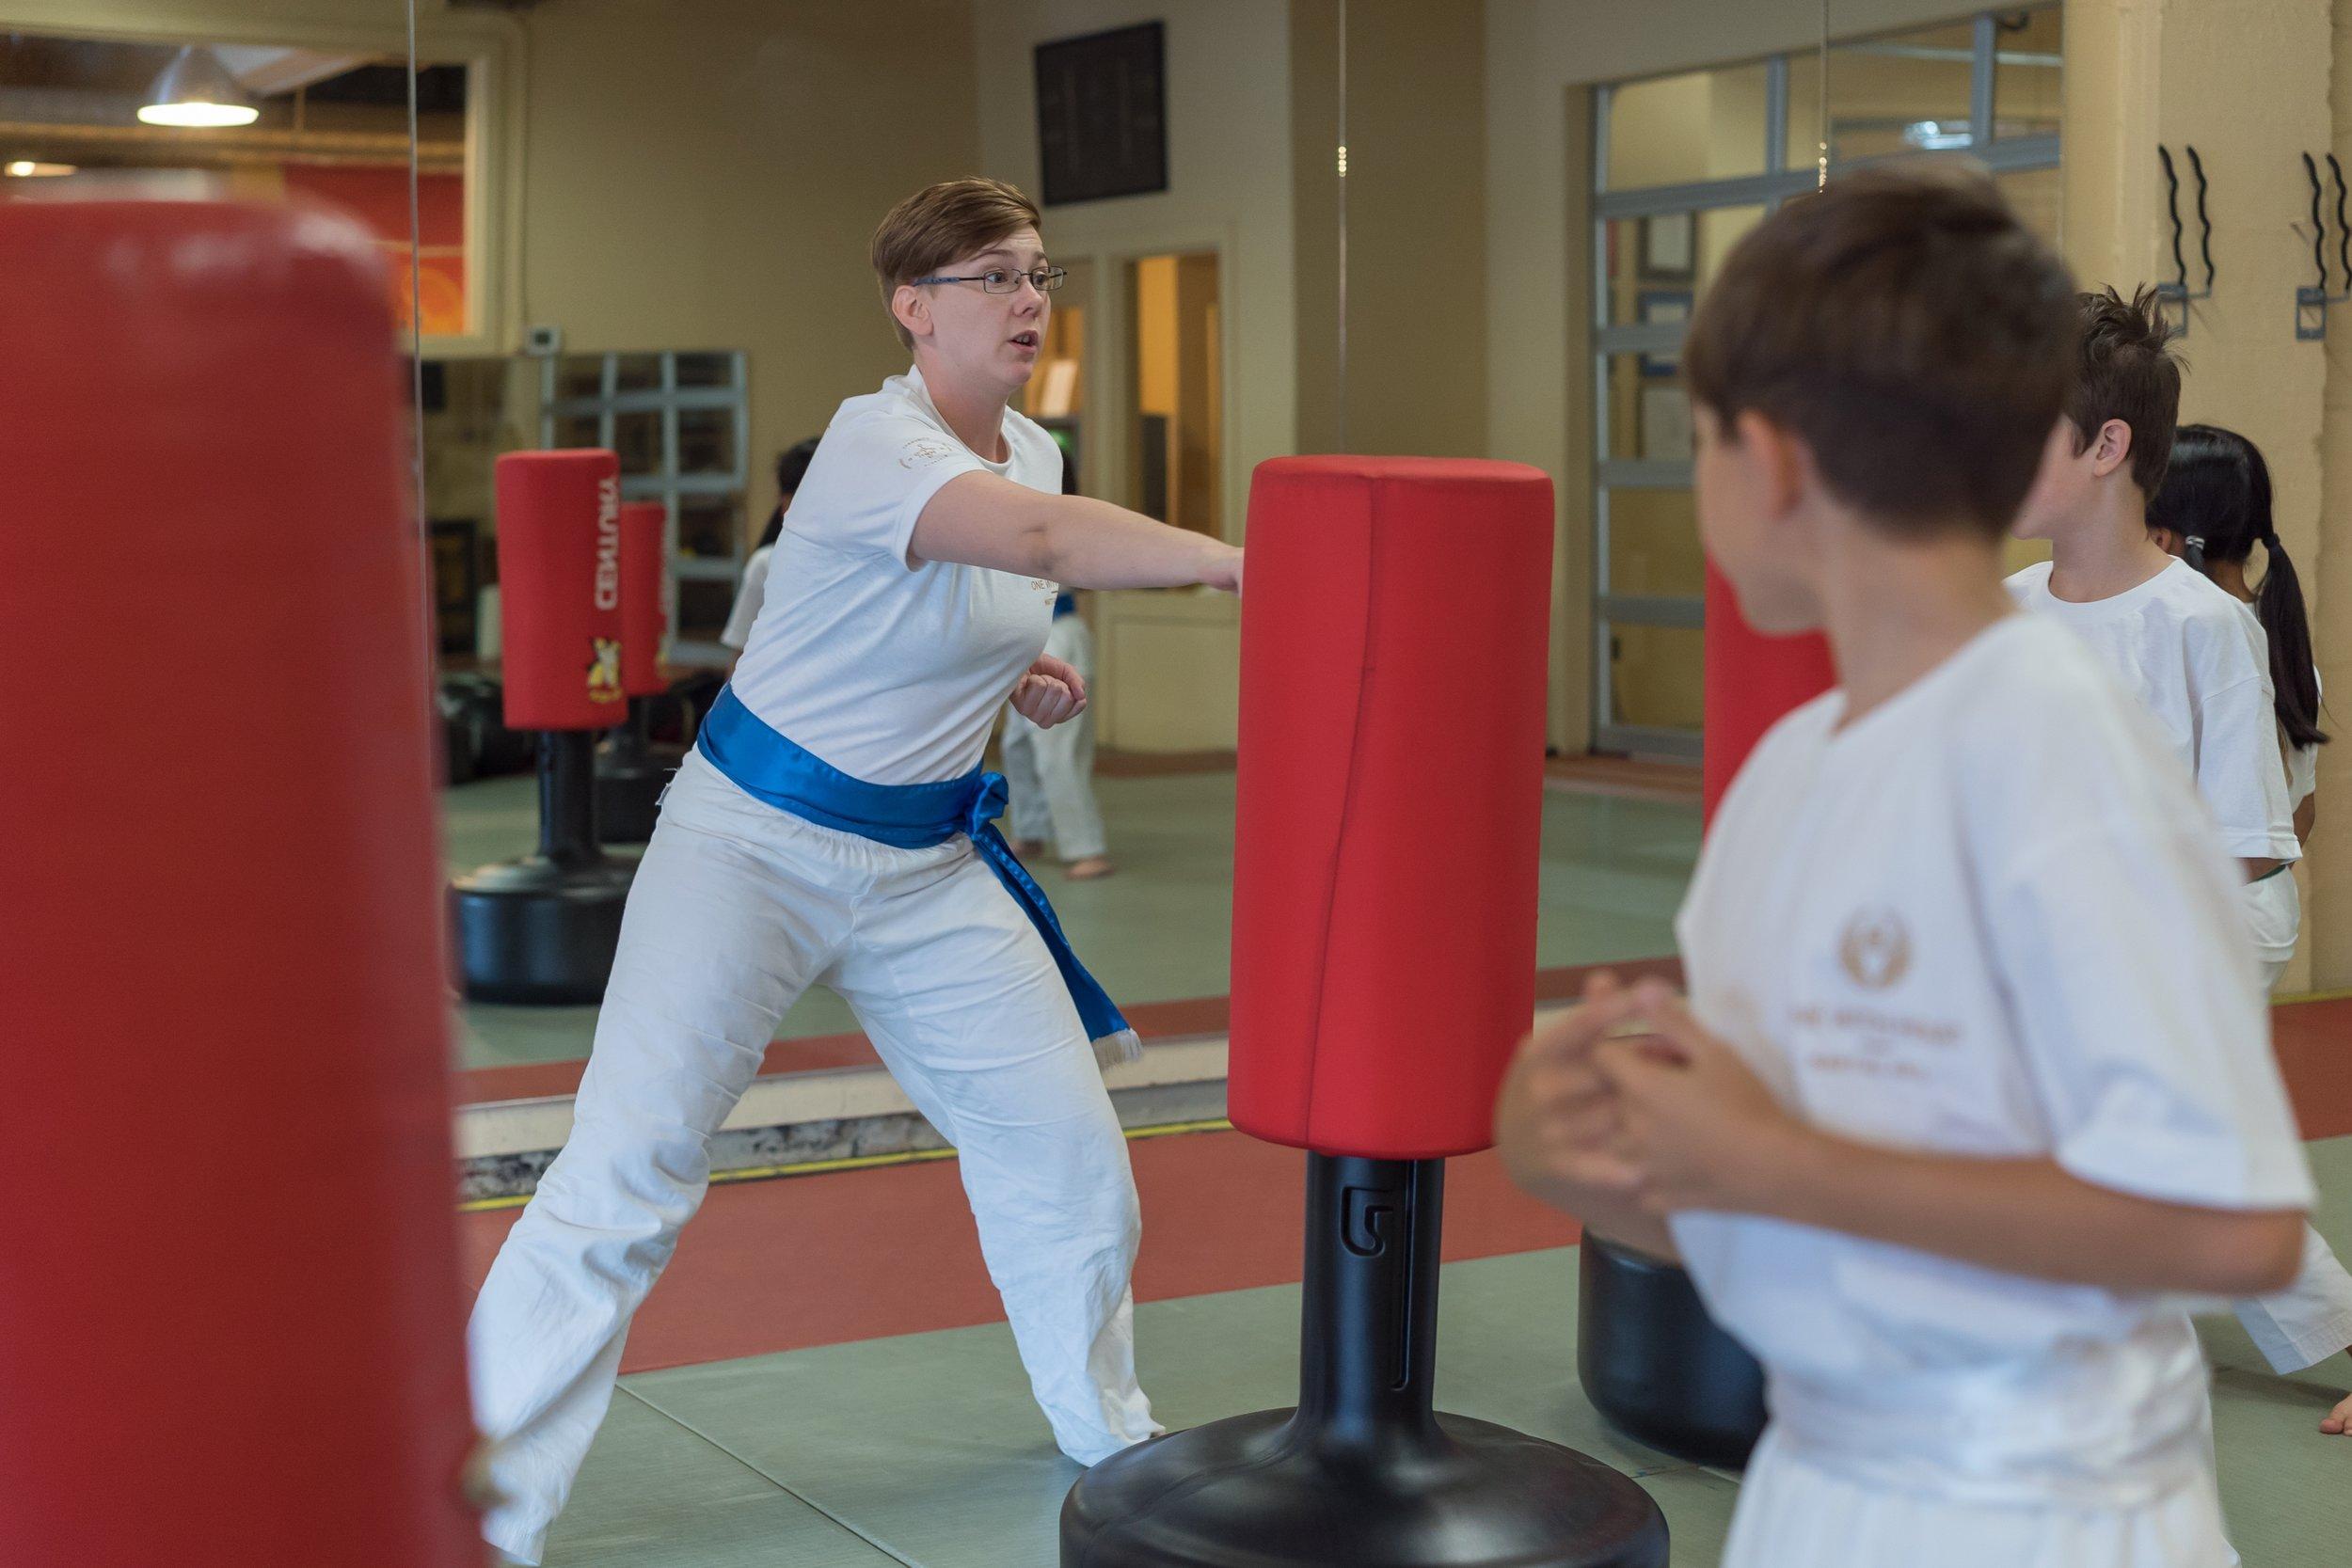 Kids Self-Defense